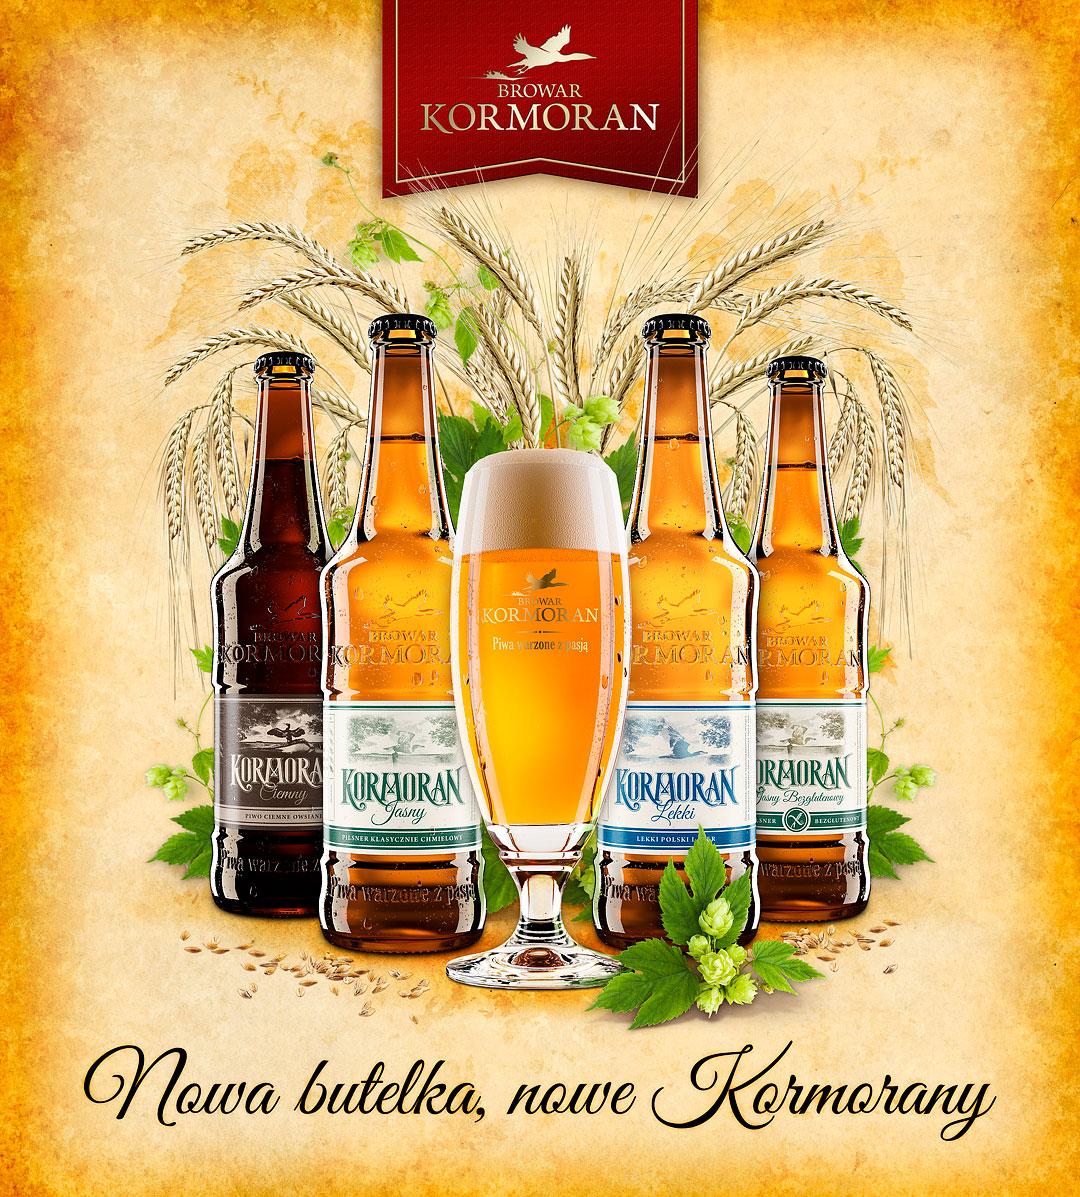 Nowa butelka, nowe Kormorany - Browar Kormoran